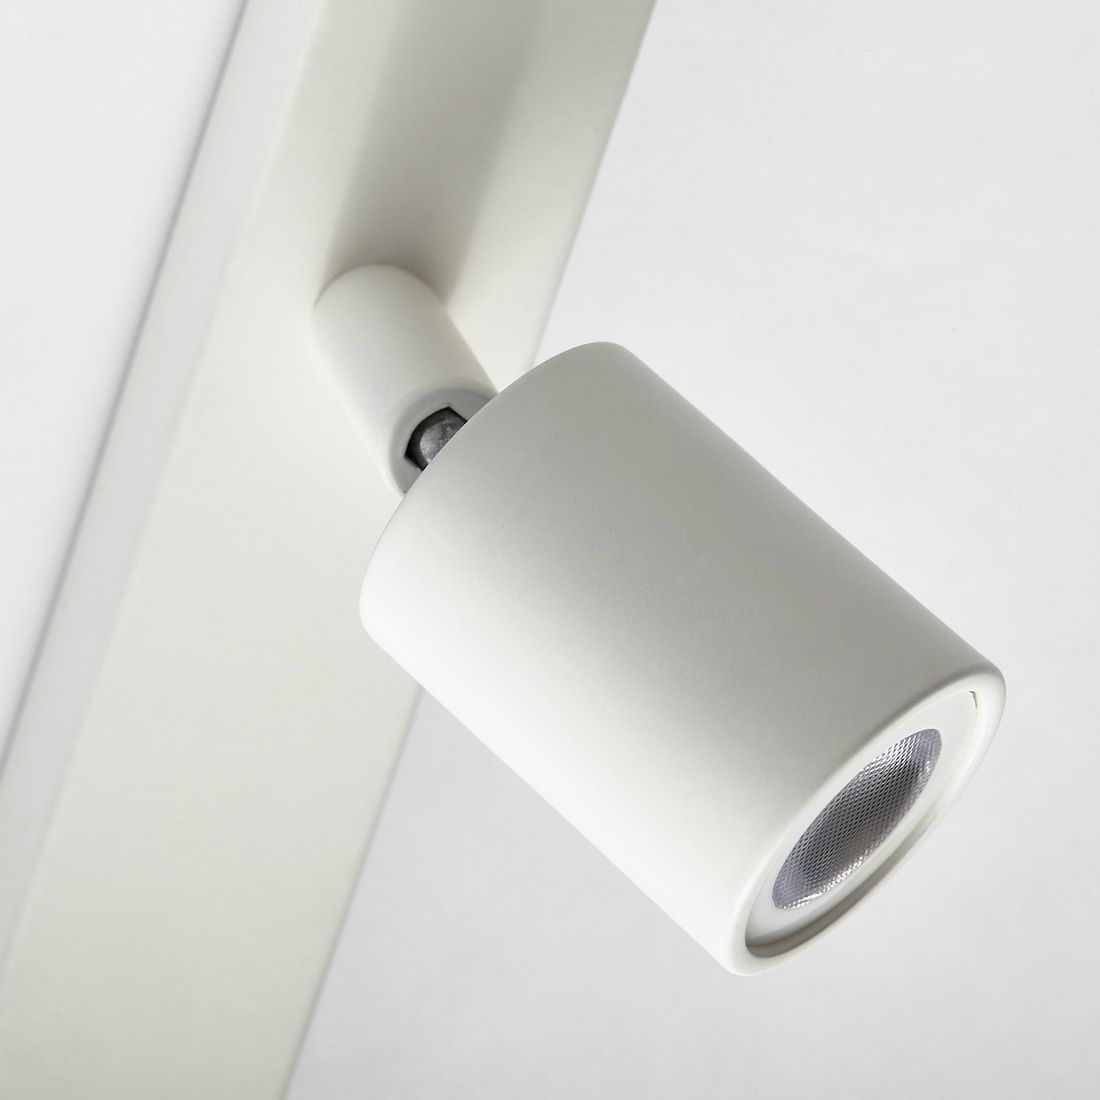 Bave Led Takskena 5 Spots Vit Ikea Led Plafond Rail Plafond Plafond